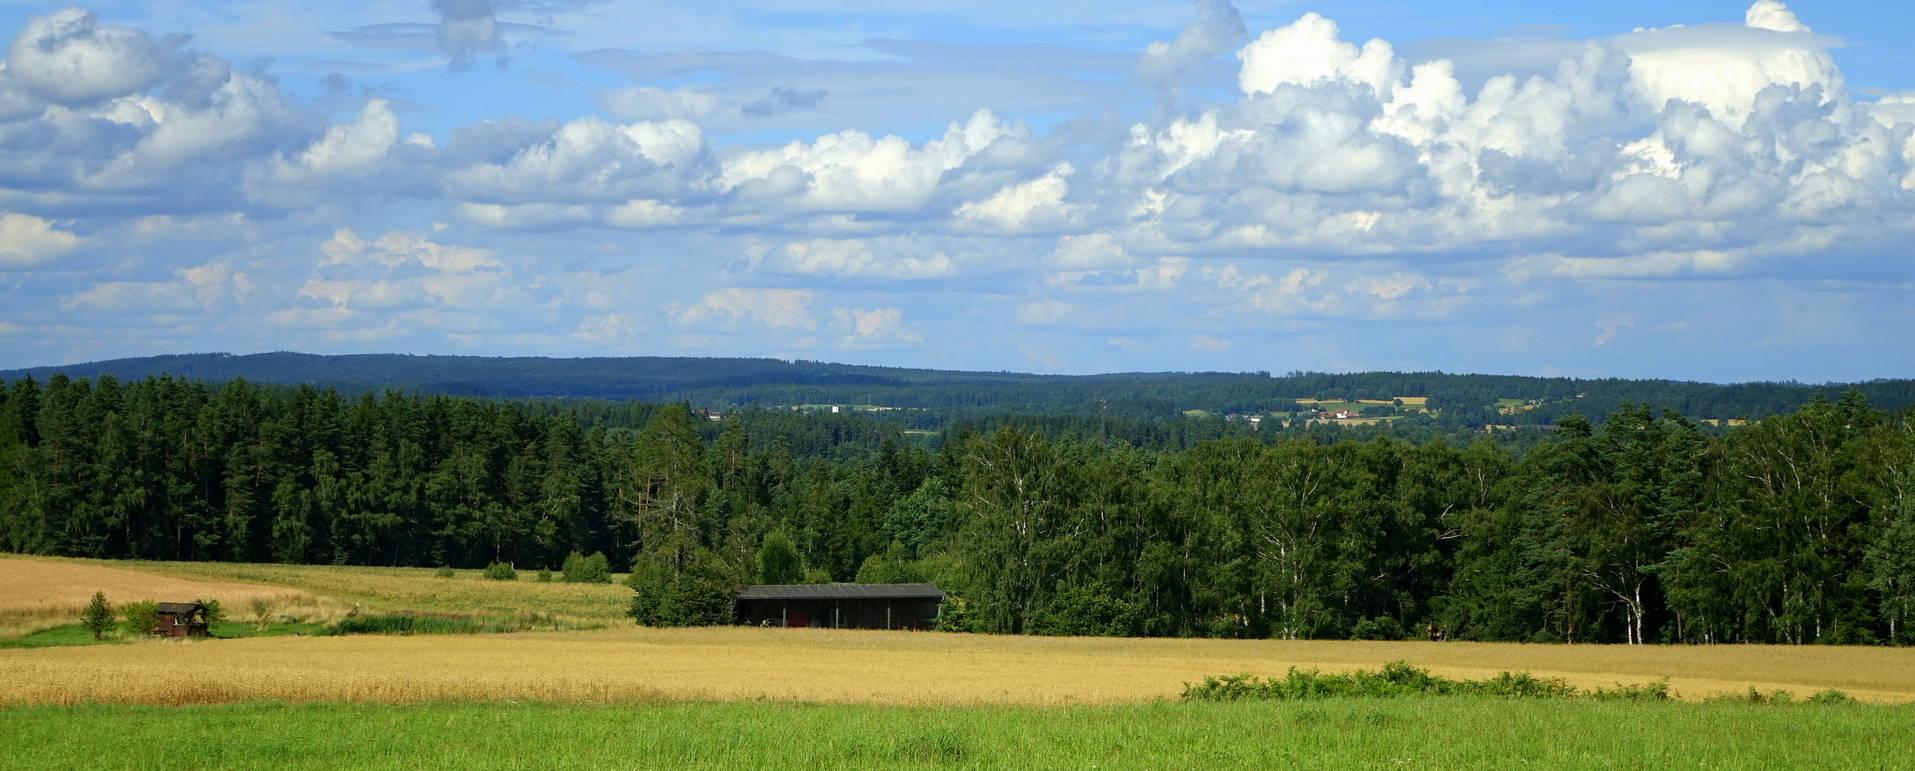 Starohuťský hřeben od Litschau